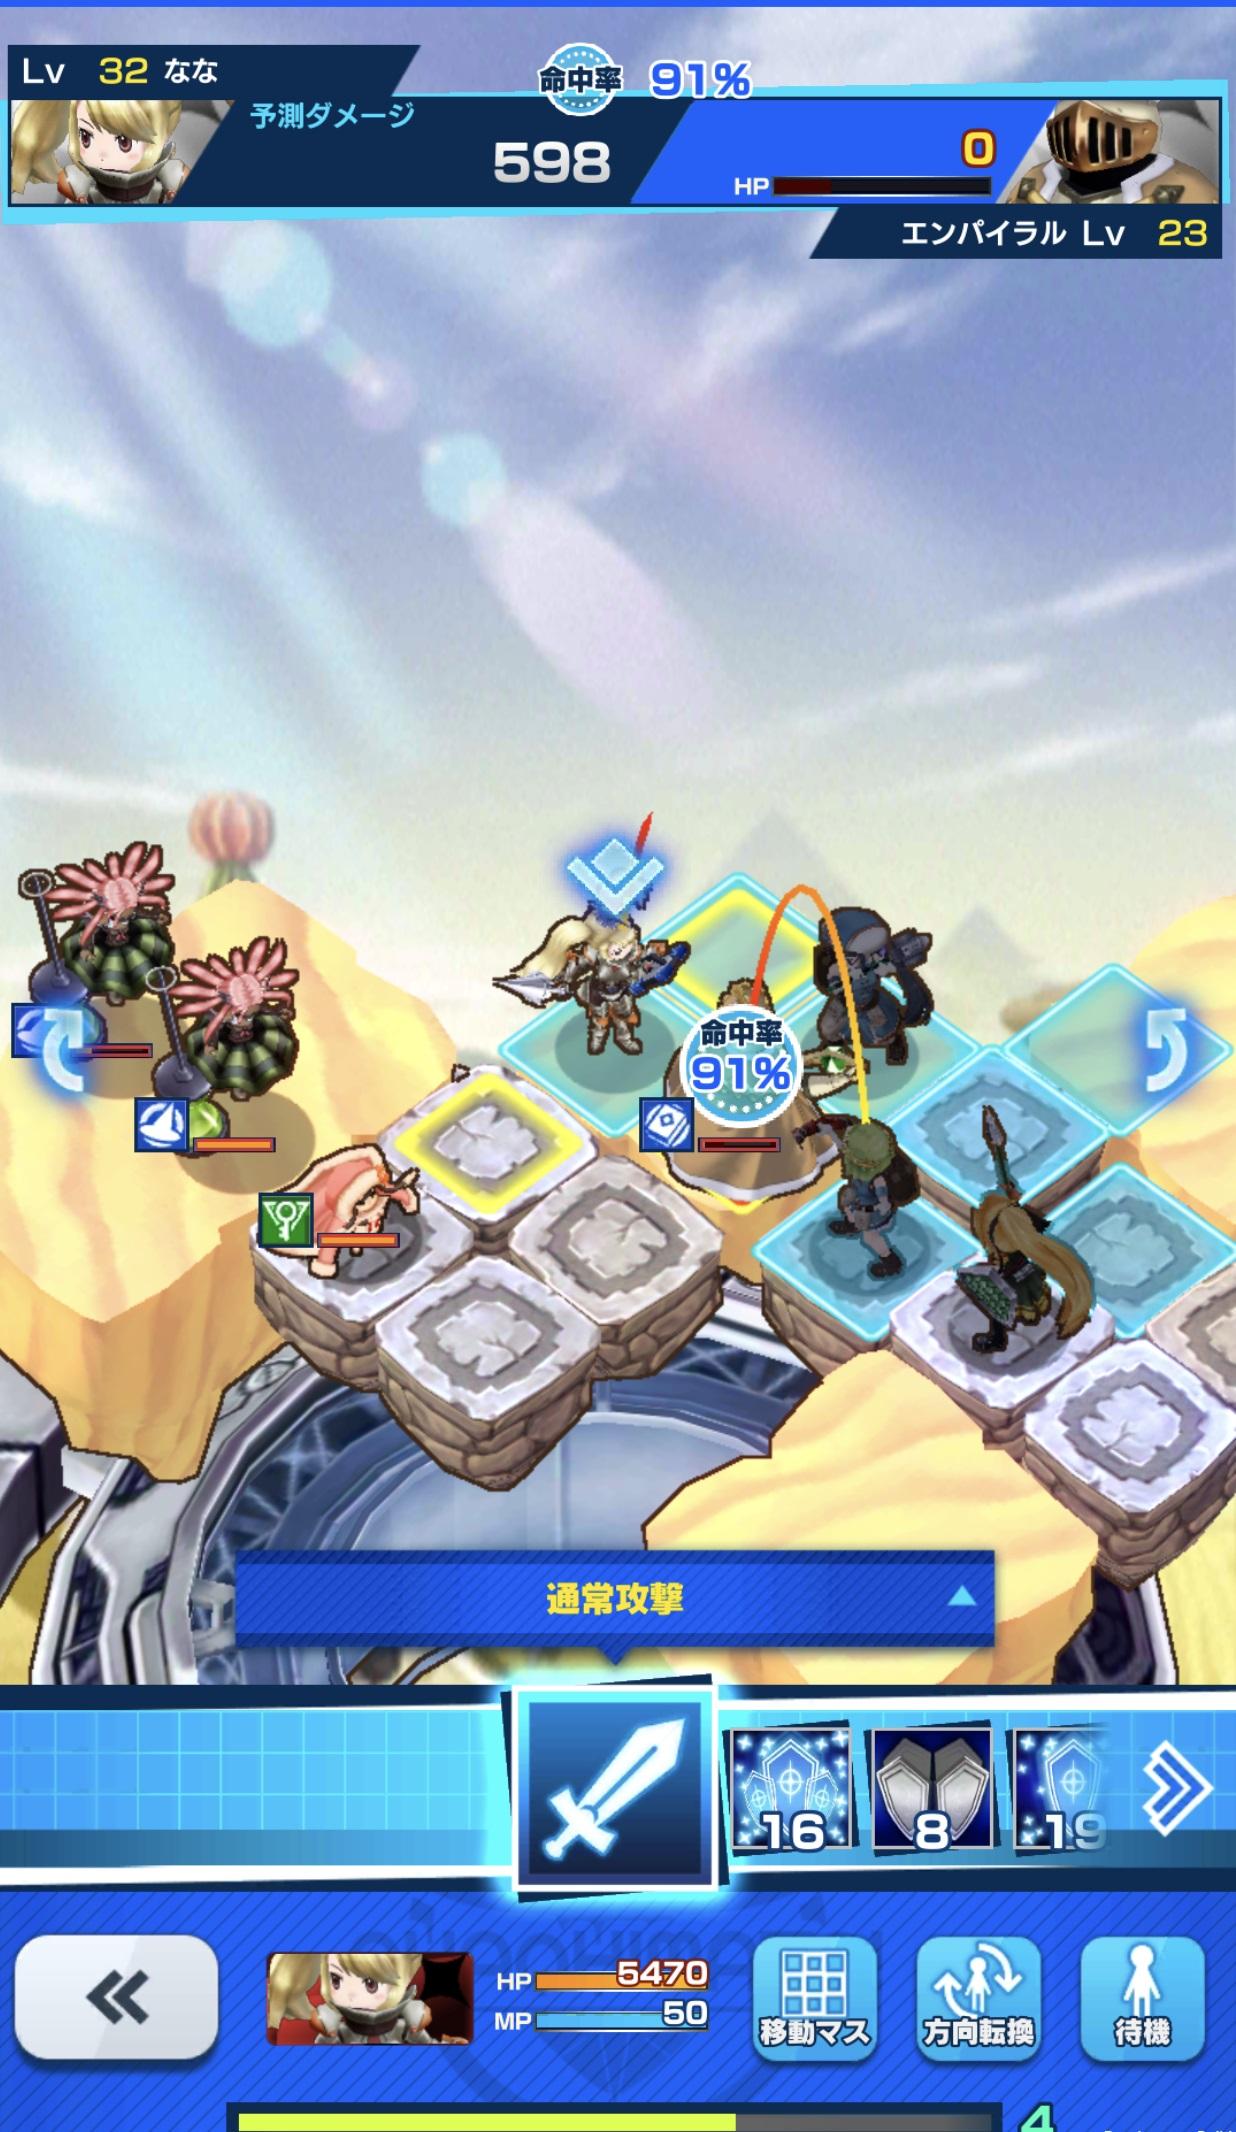 /theme/dengekionline/shachibato/images/system/Battle_06